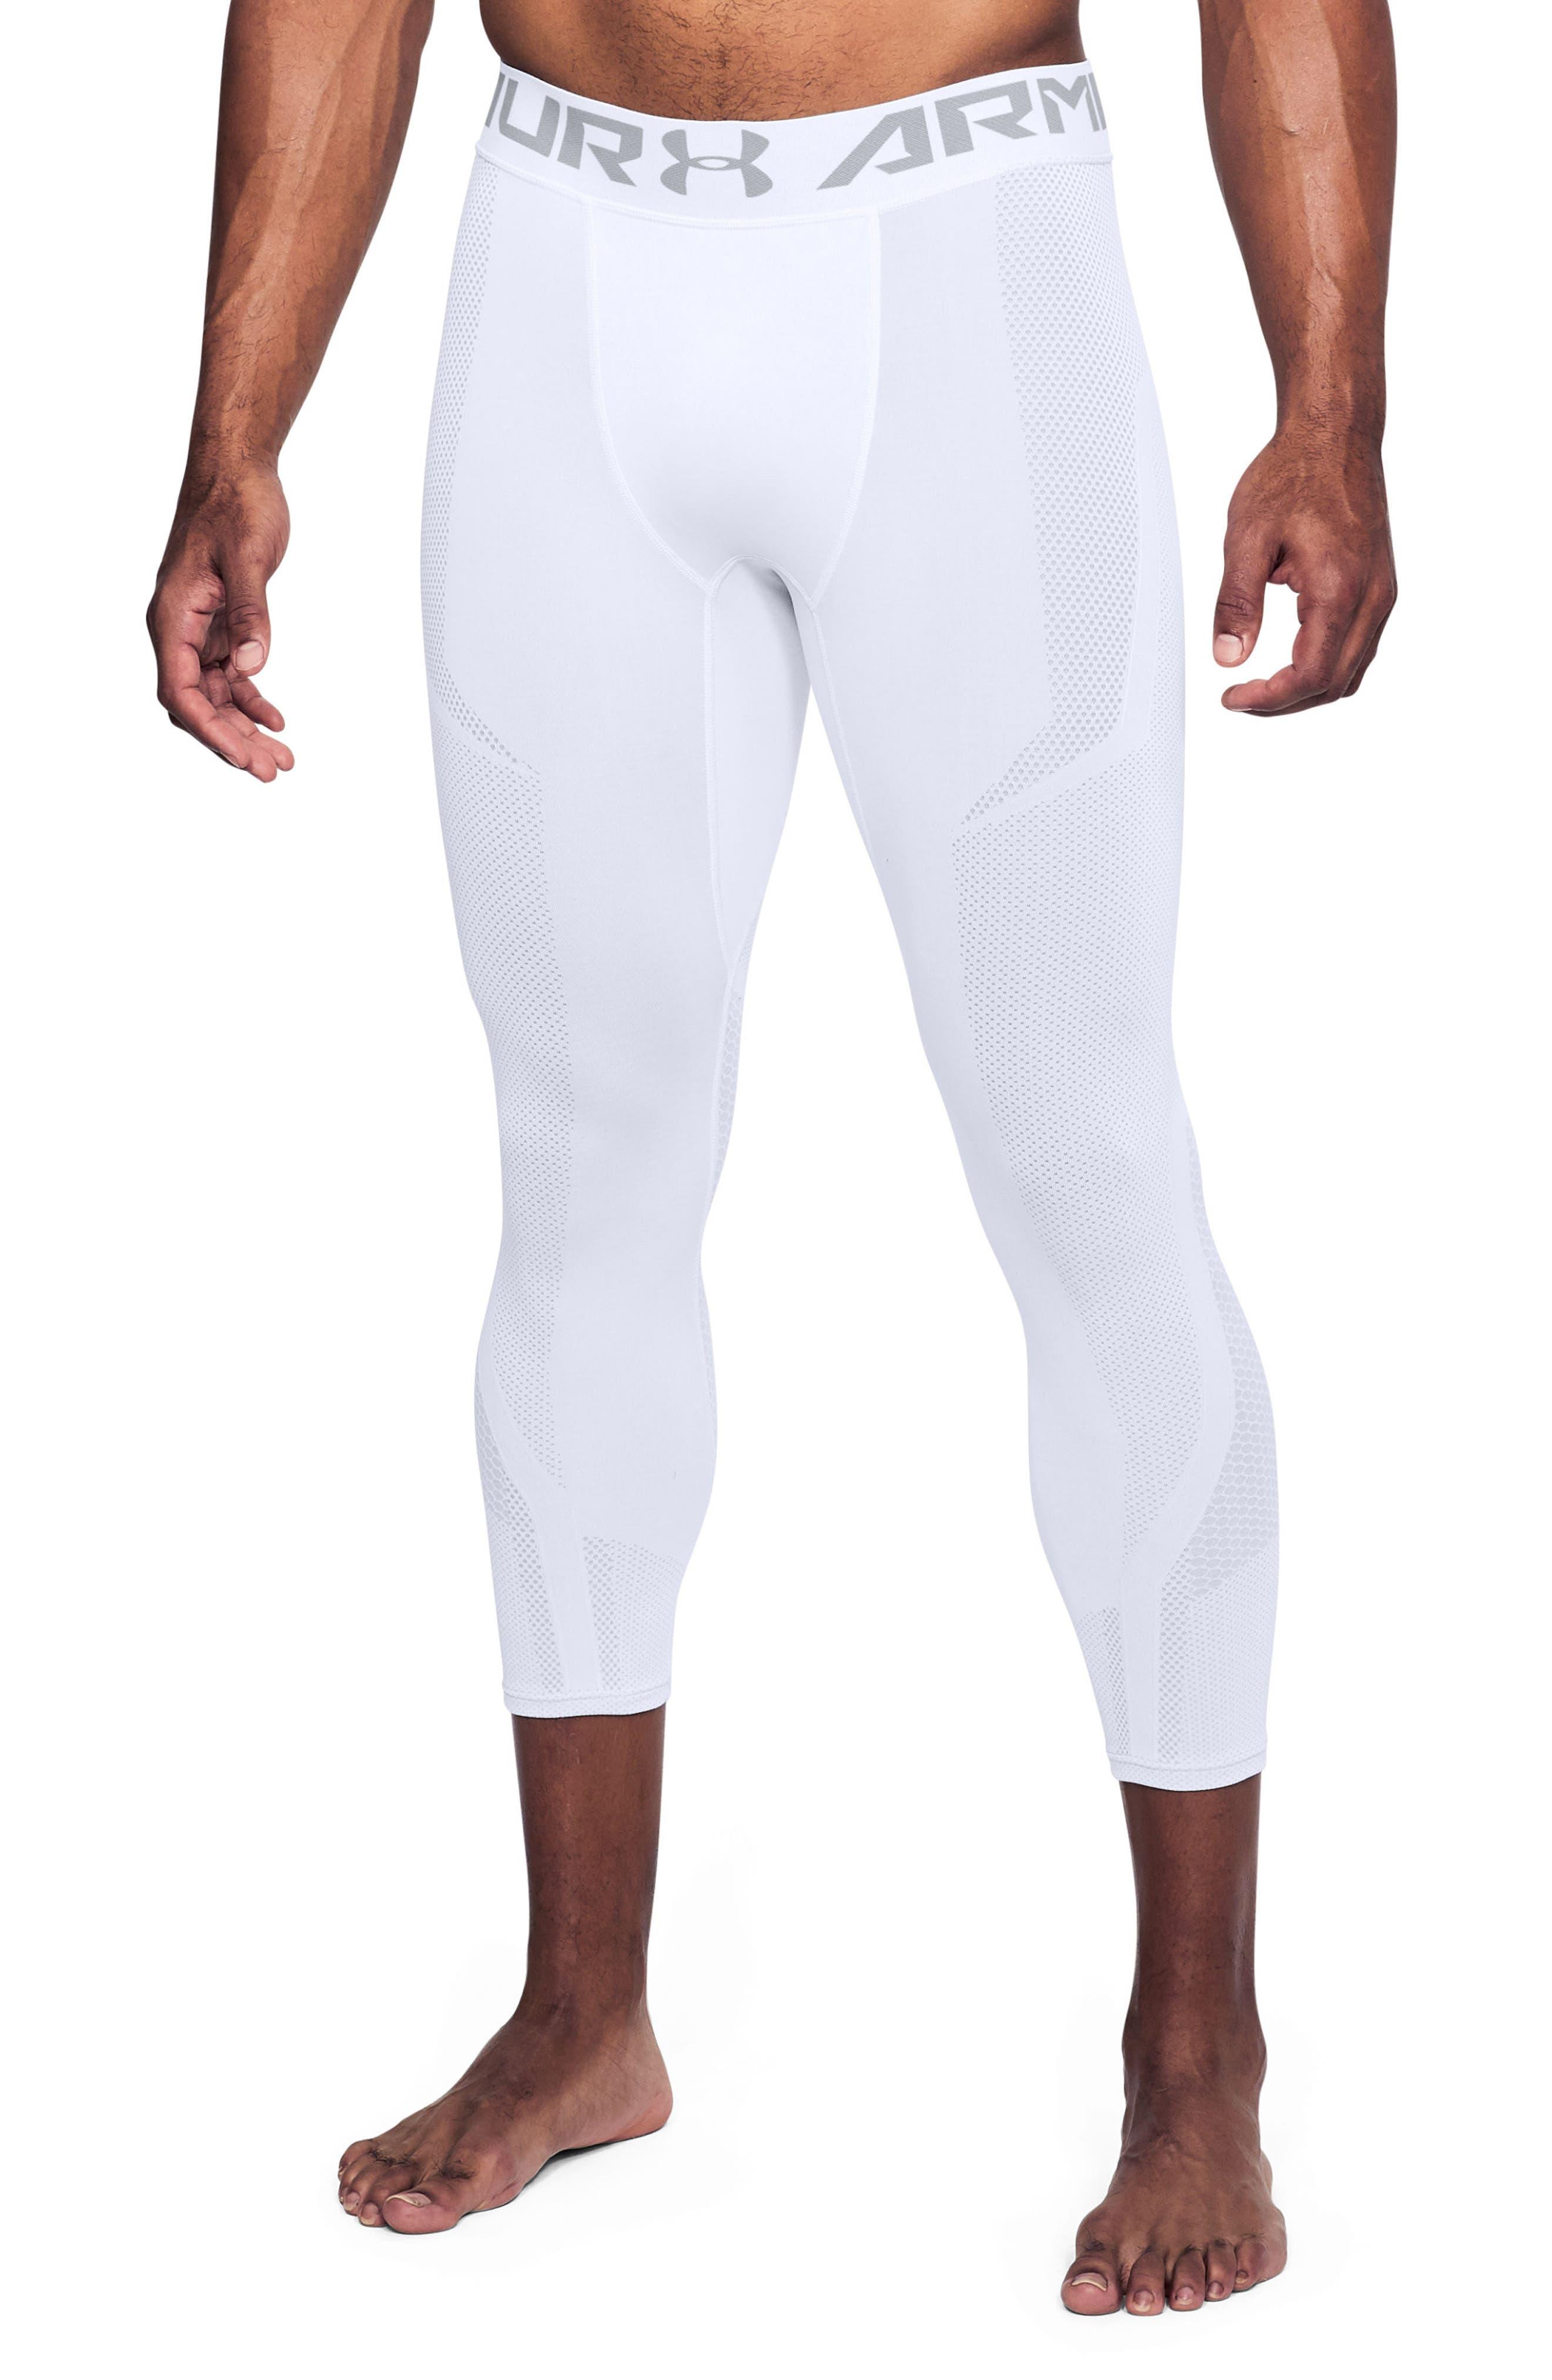 Threadborne Seamless Pants,                             Main thumbnail 1, color,                             White/ Overcast Gray